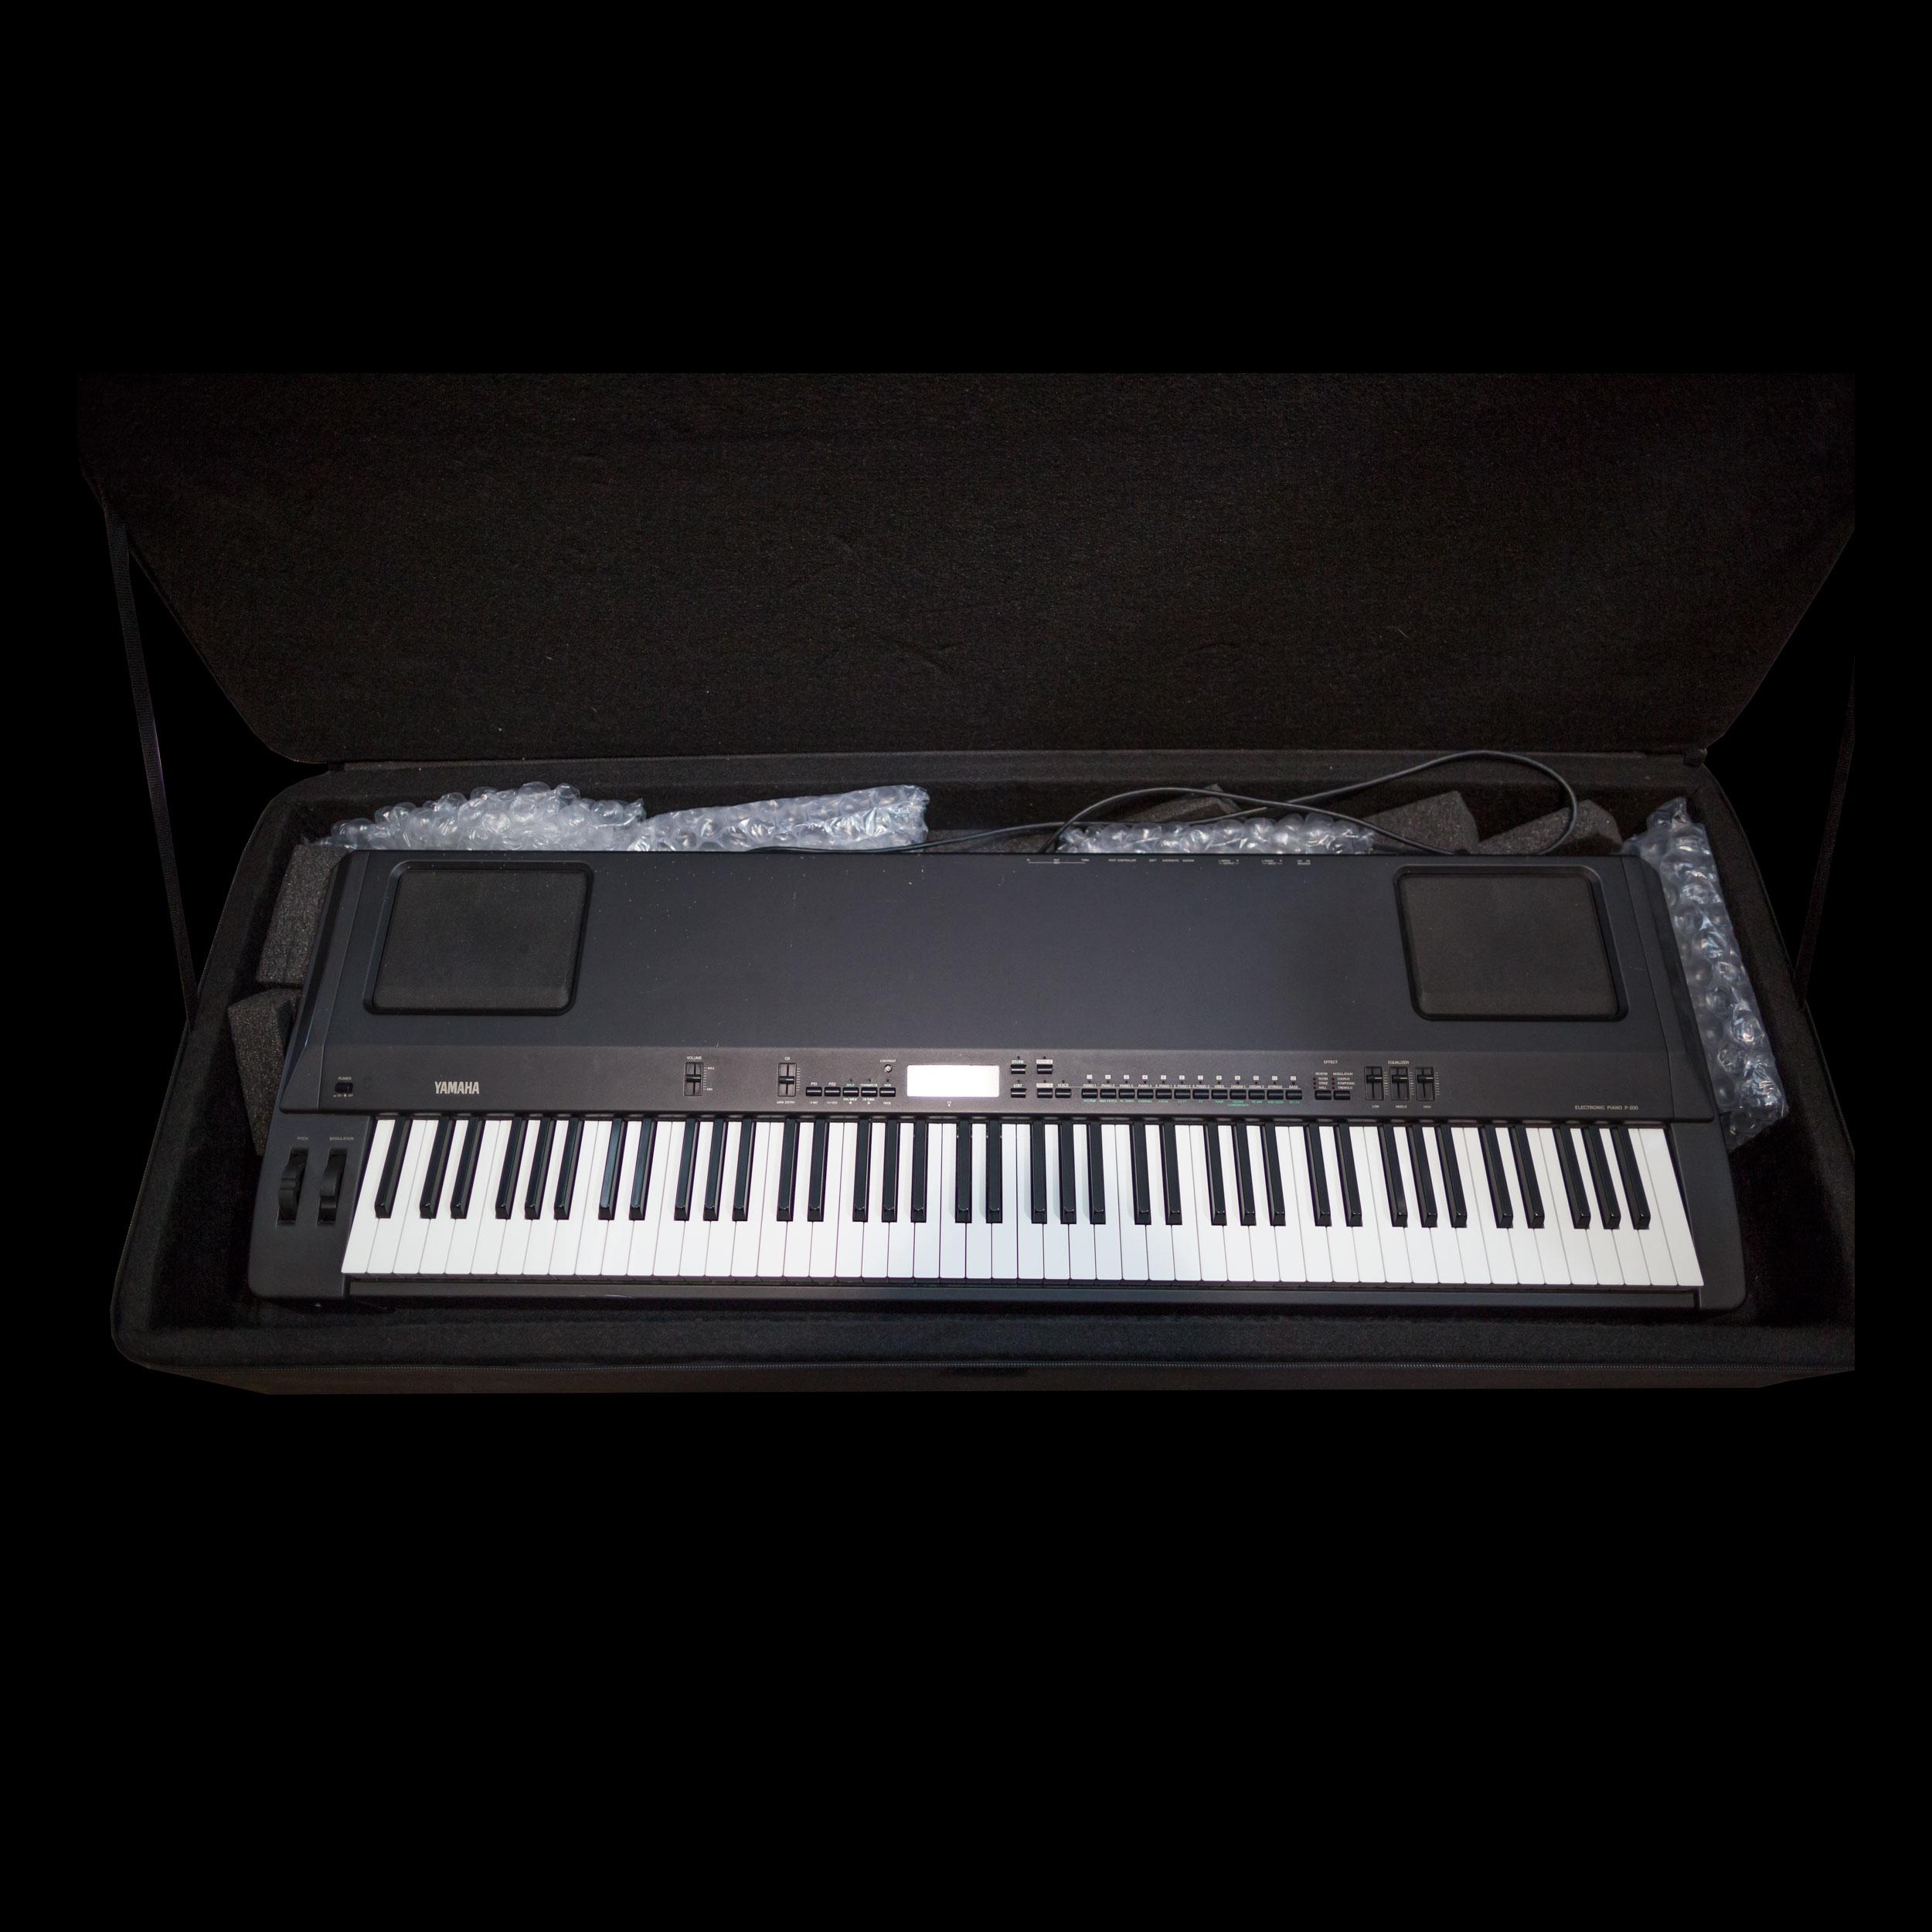 yamaha p200 digital piano ebay. Black Bedroom Furniture Sets. Home Design Ideas